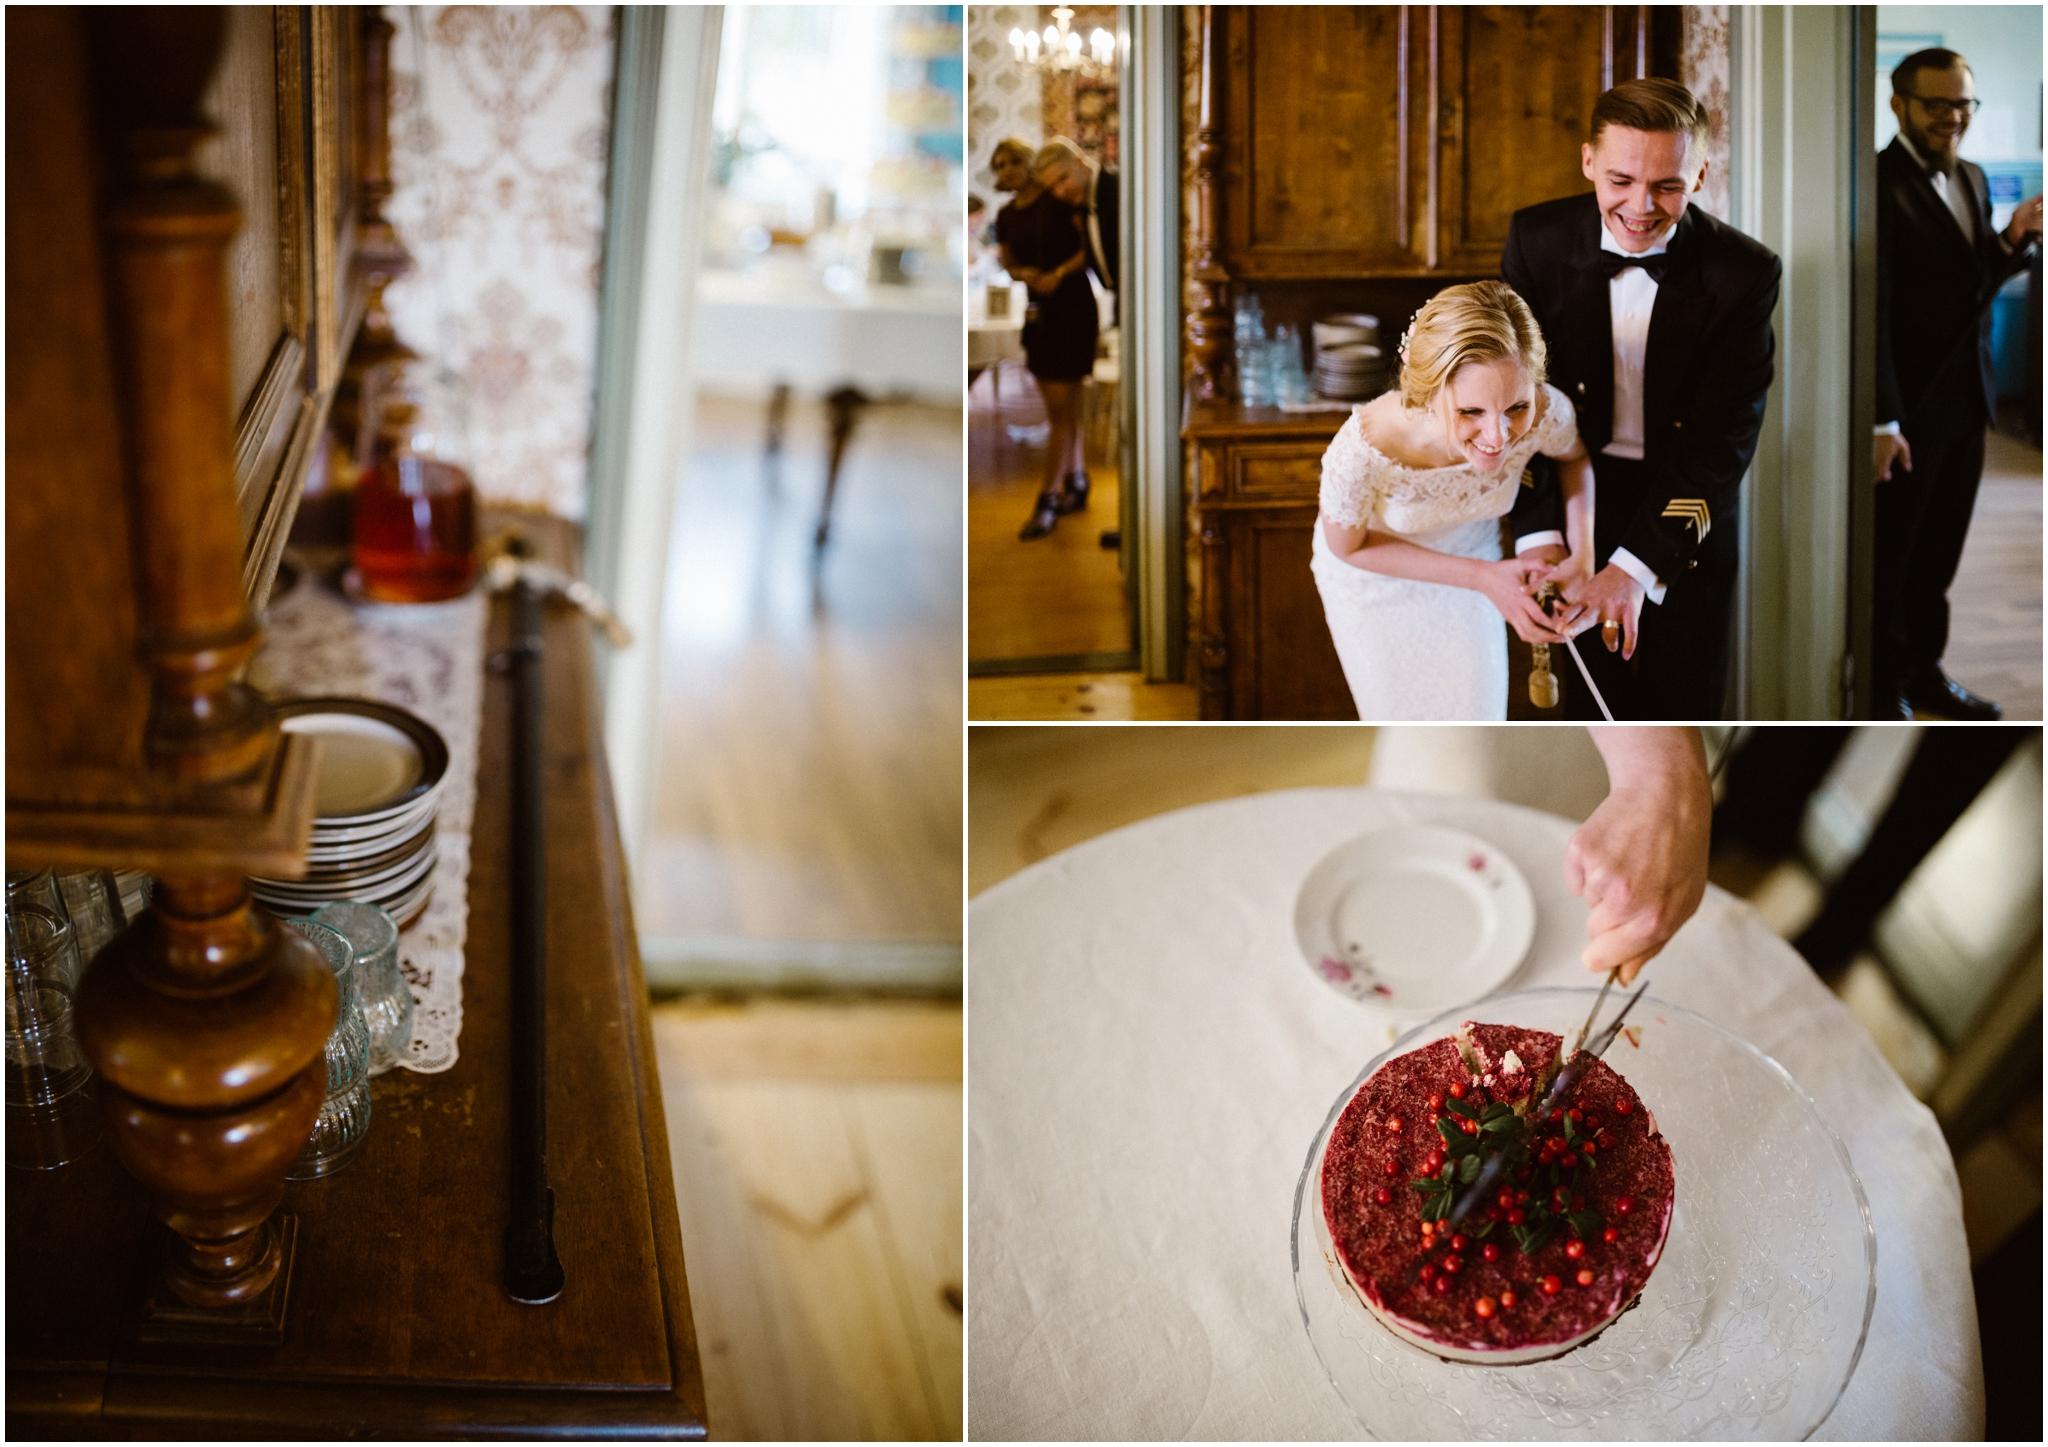 Pinja + Marko -- Patrick Karkkolainen Wedding Photographer-170.jpg